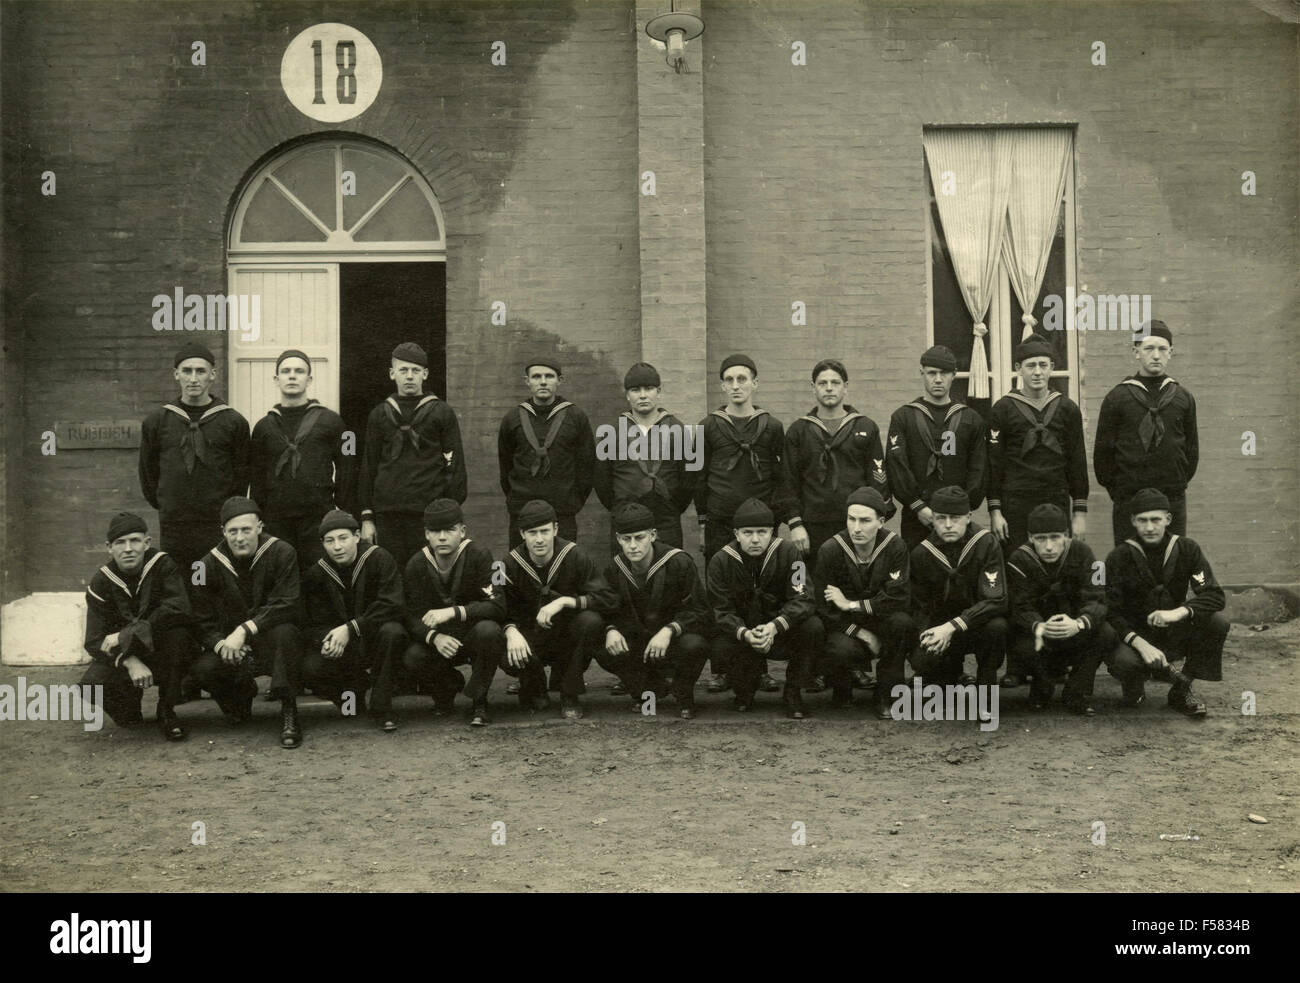 Group photo of Marines - Stock Image